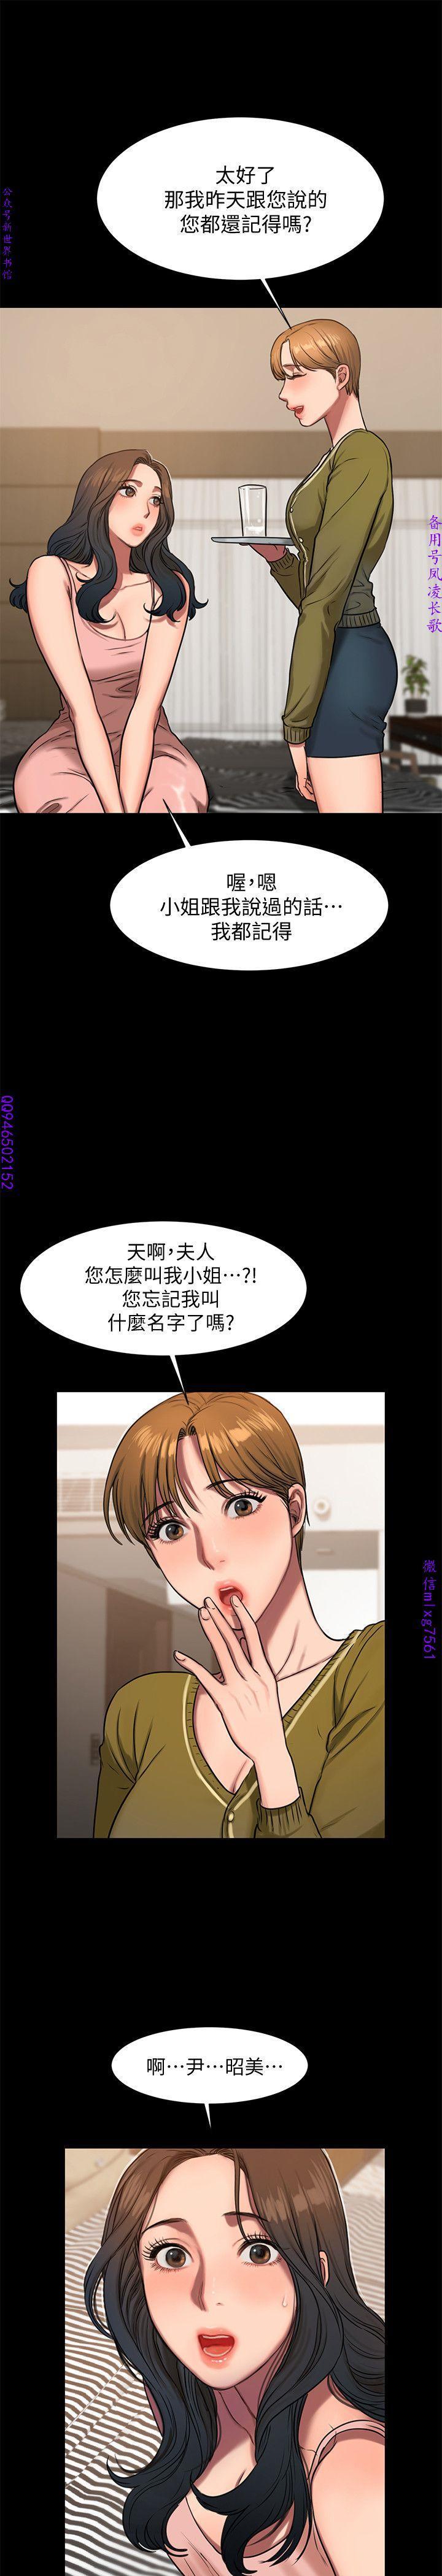 Run away 1-10【中文】 195